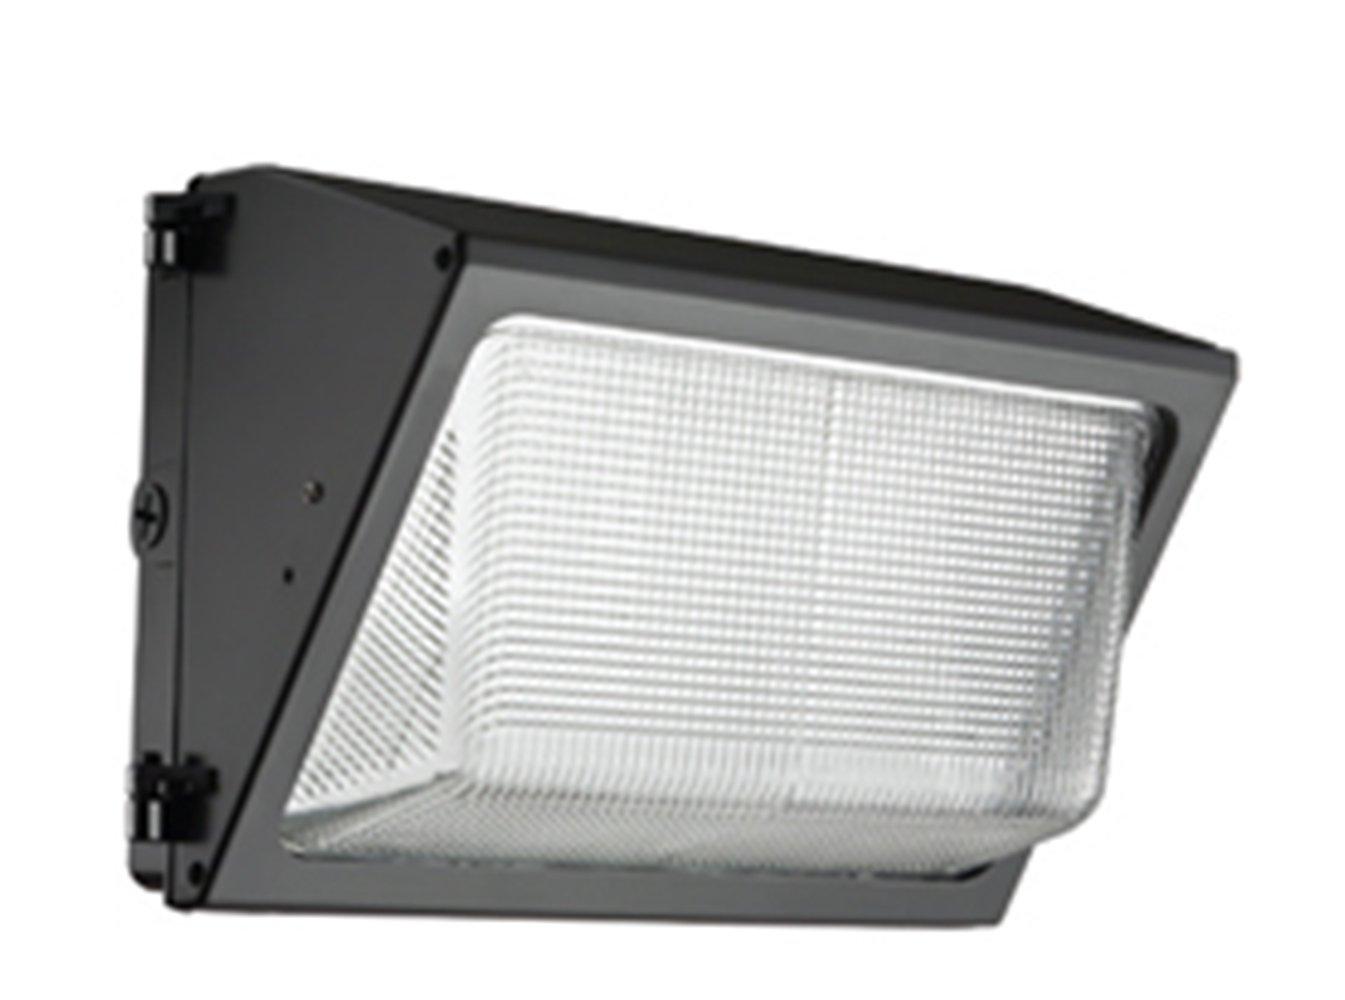 Lithonia Lighting TWR1 150M TB LPI 150W Metal Halide Cast Wall Pack ...